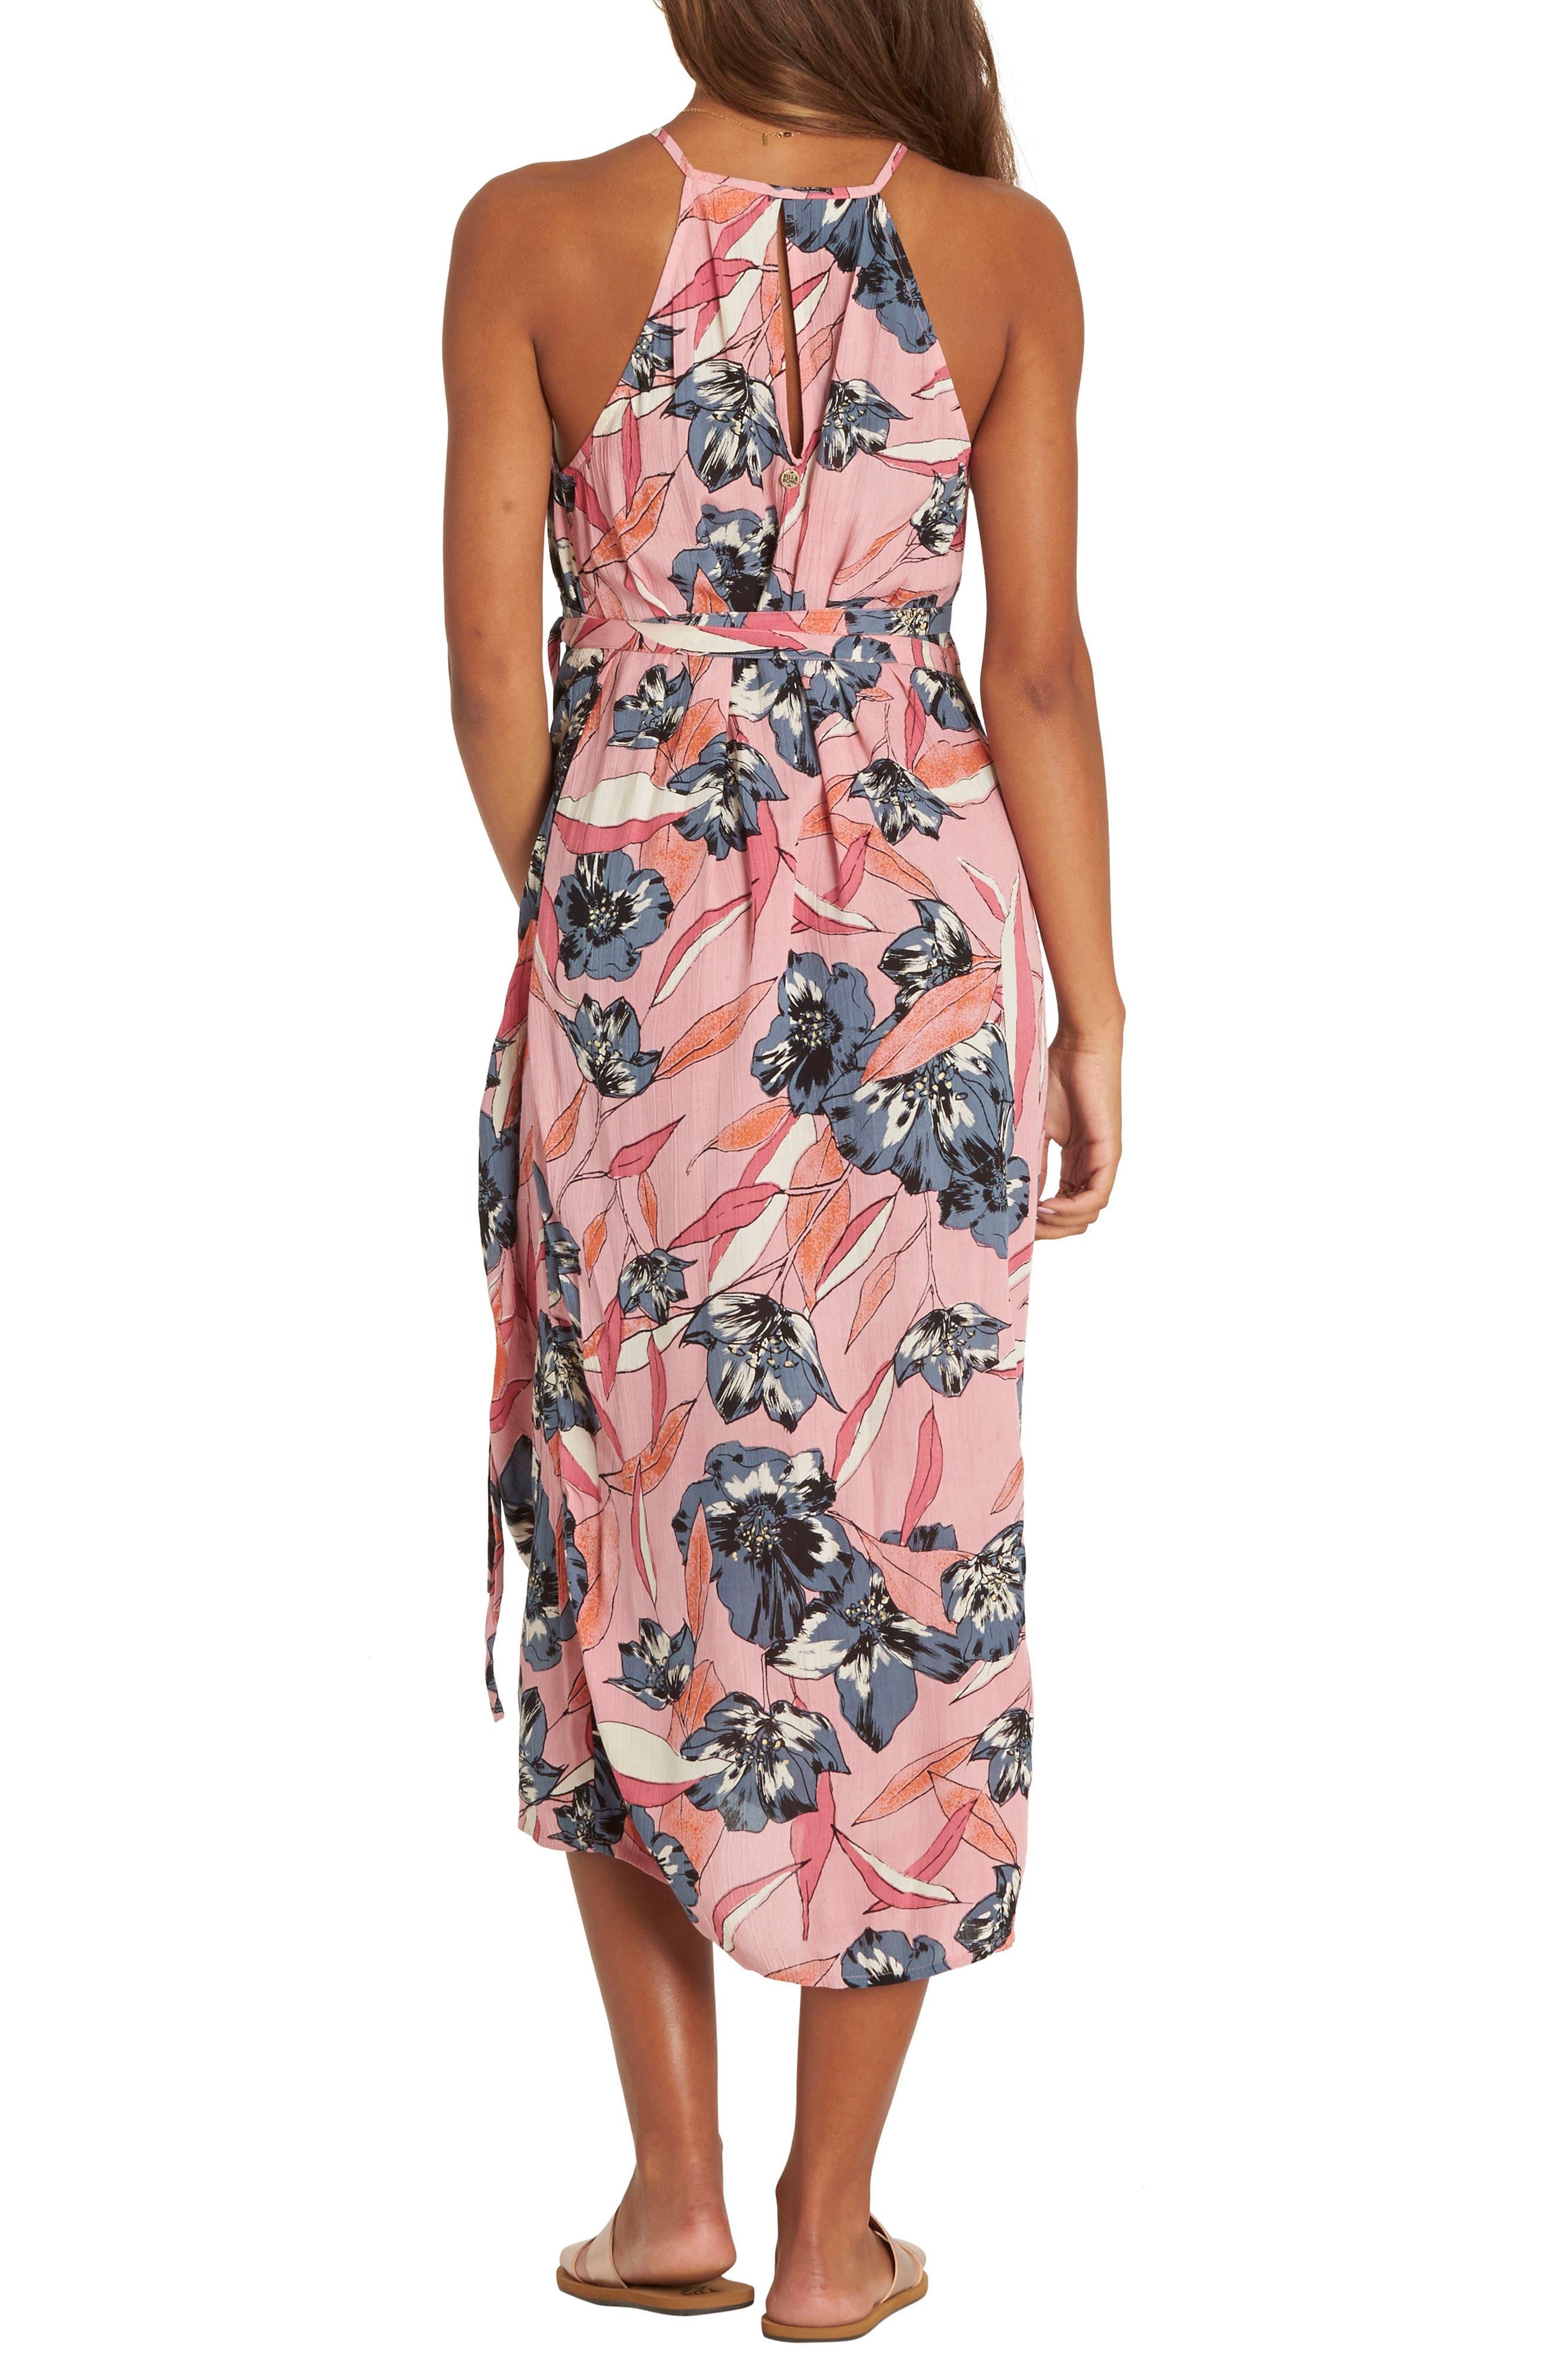 Aloha Babe Midi Wrap Dress,                             Alternate thumbnail 2, color,                             650